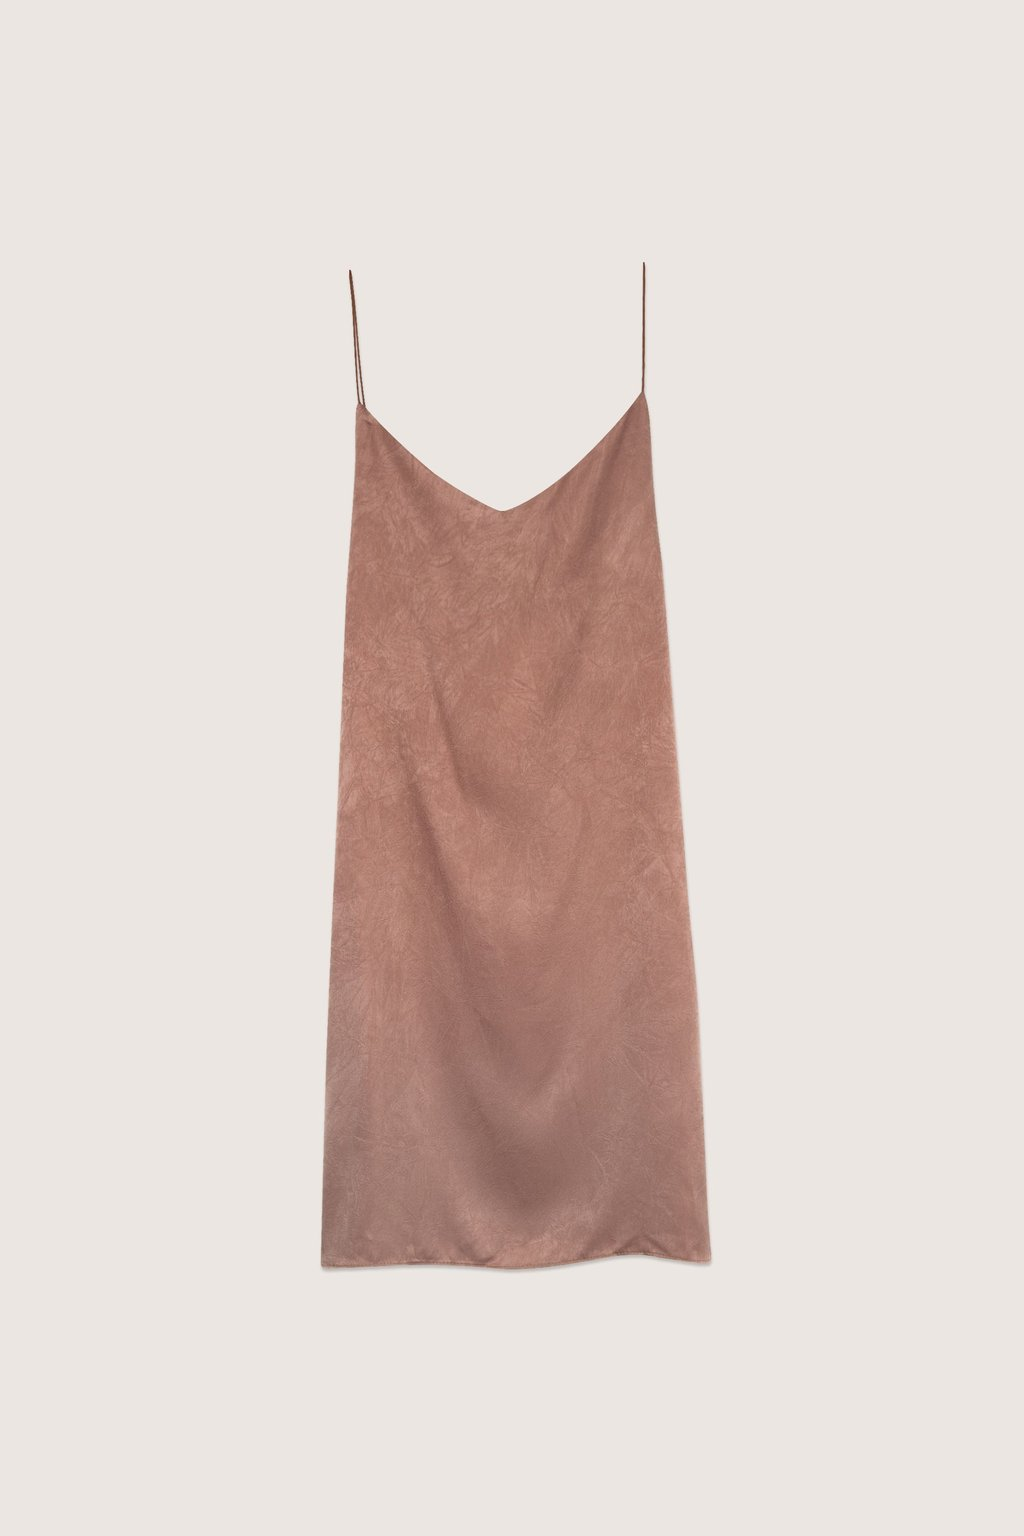 Dress H233 Beige 5